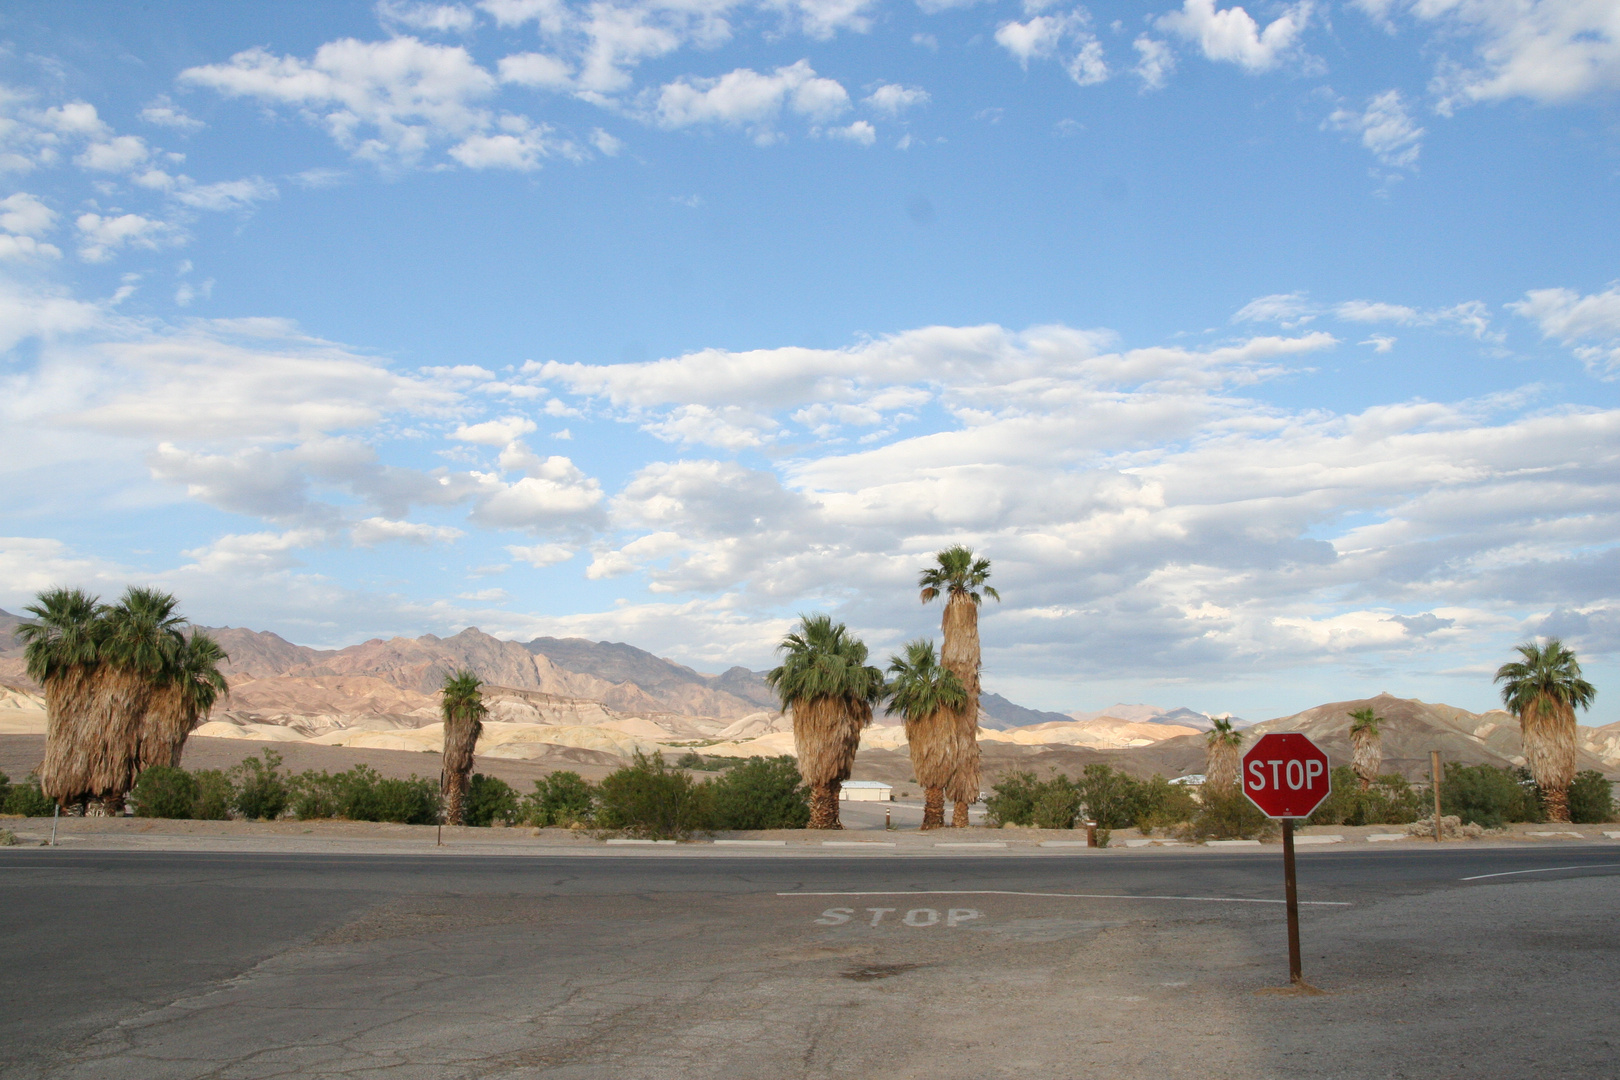 Stop - ab hier Wüste